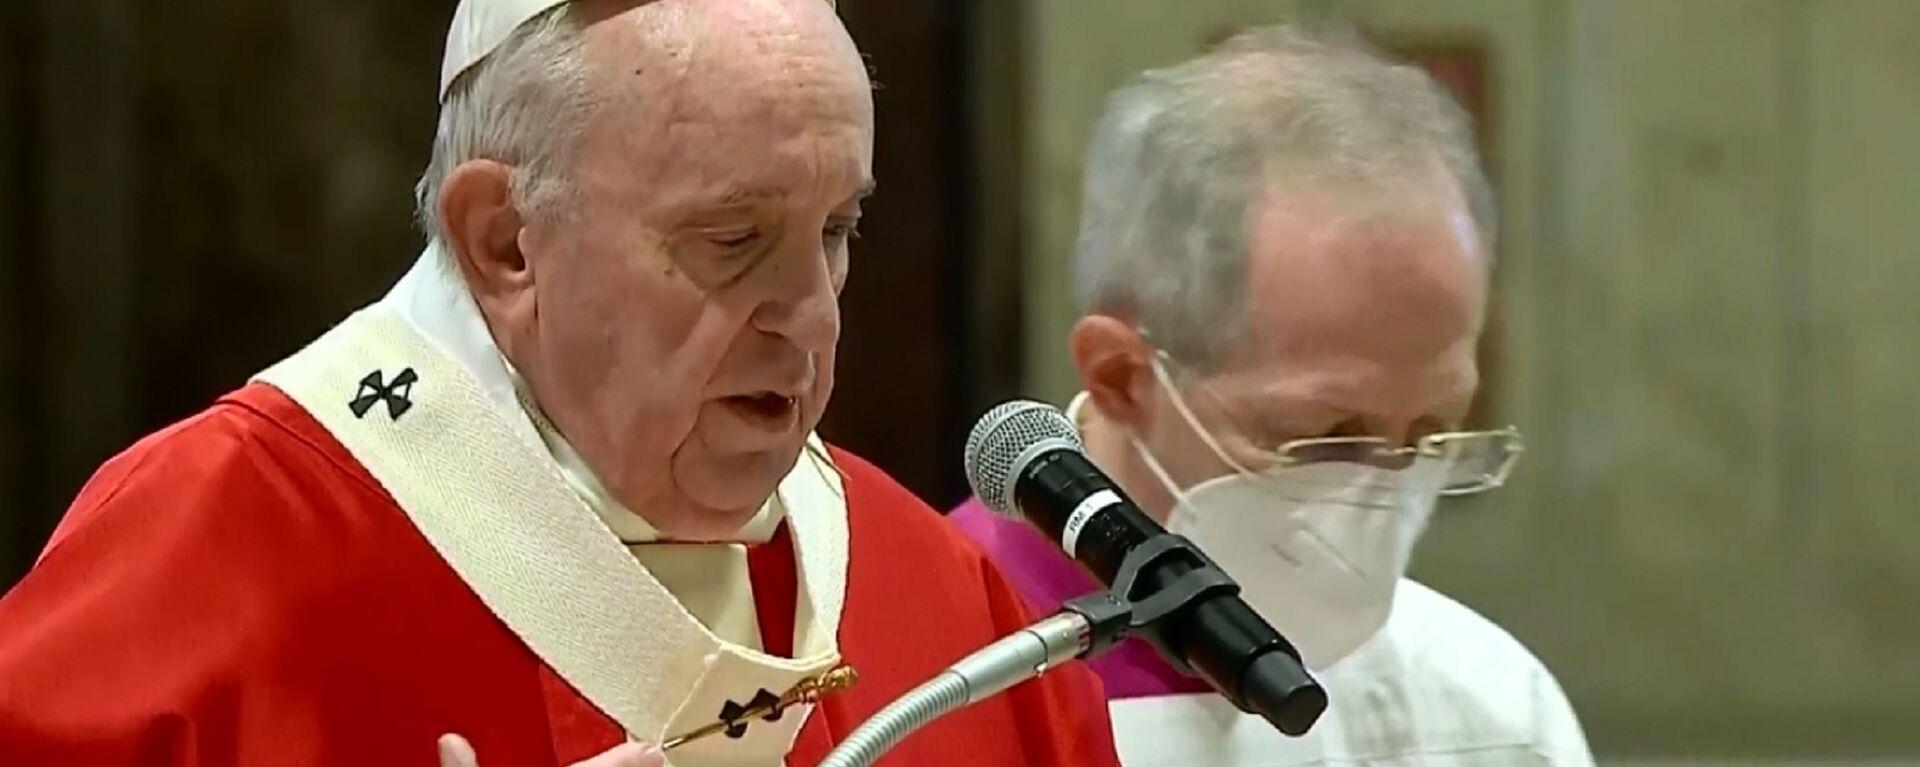 Papa Francesco celebra Domenica delle Palme tra pochi invitati - Sputnik Italia, 1920, 04.07.2021